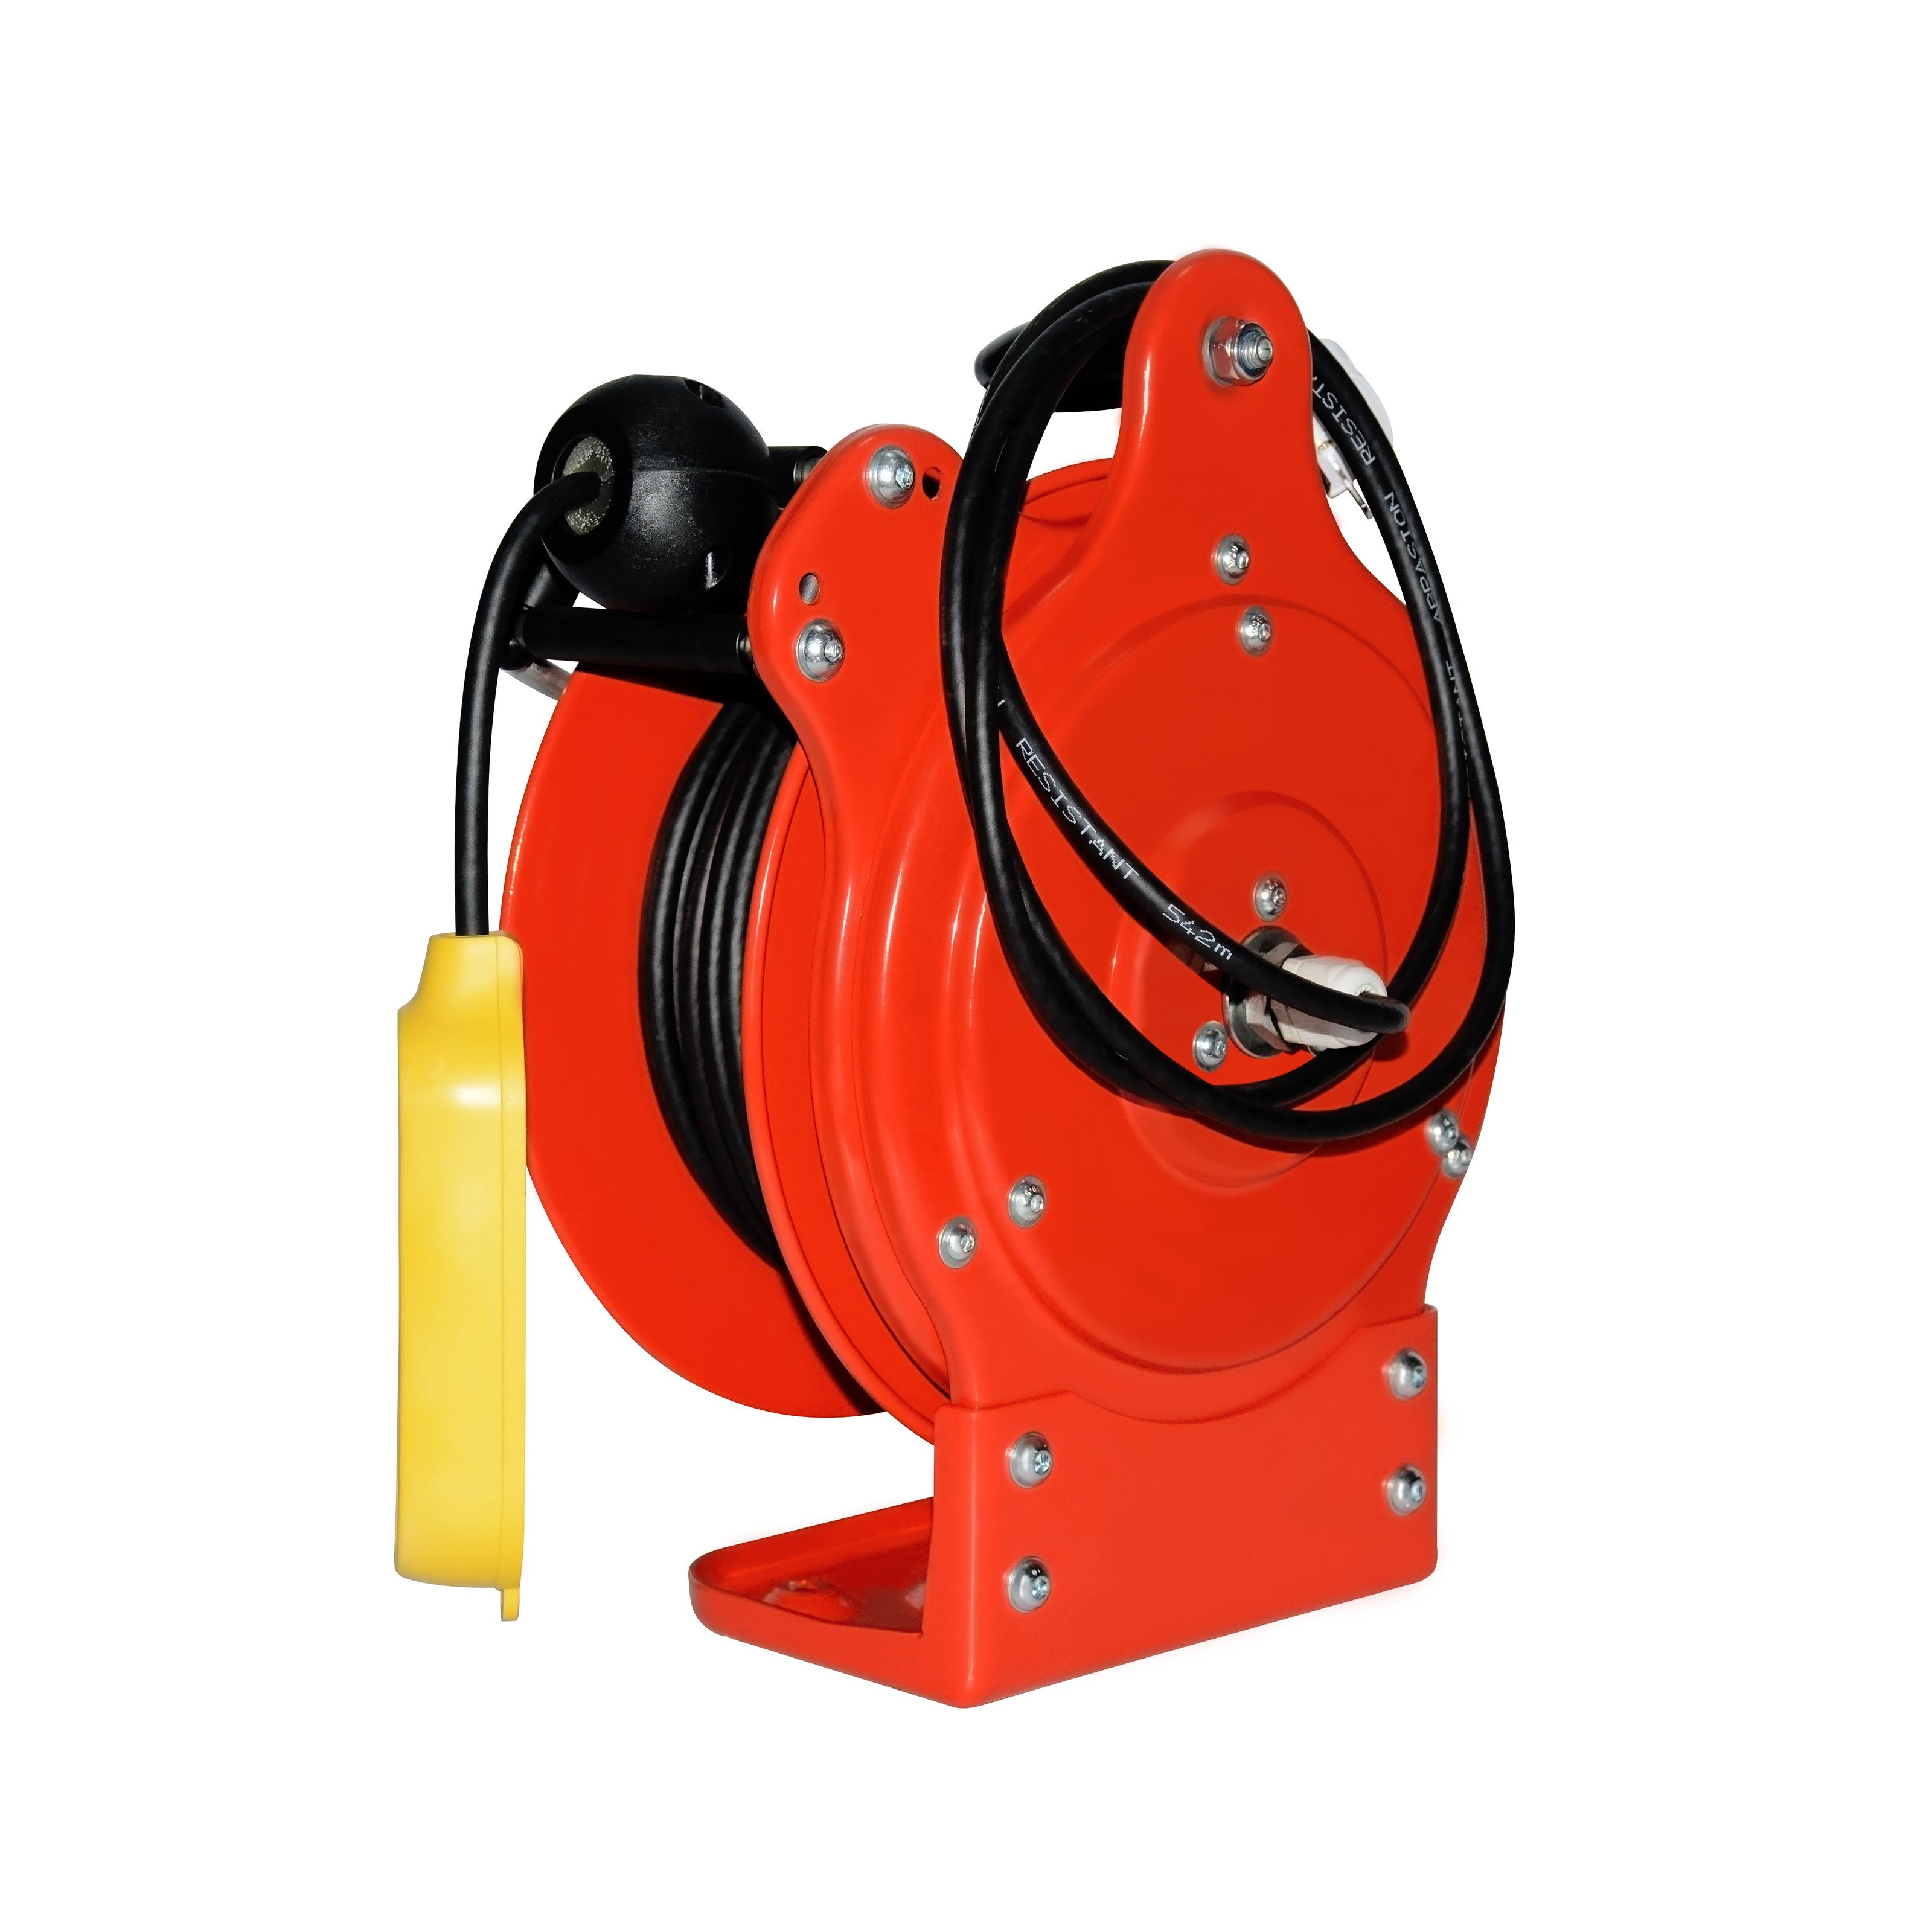 EB300系列电线卷线器 工程机械线缆卷盘 插座线卷盘 EB300电缆卷线器